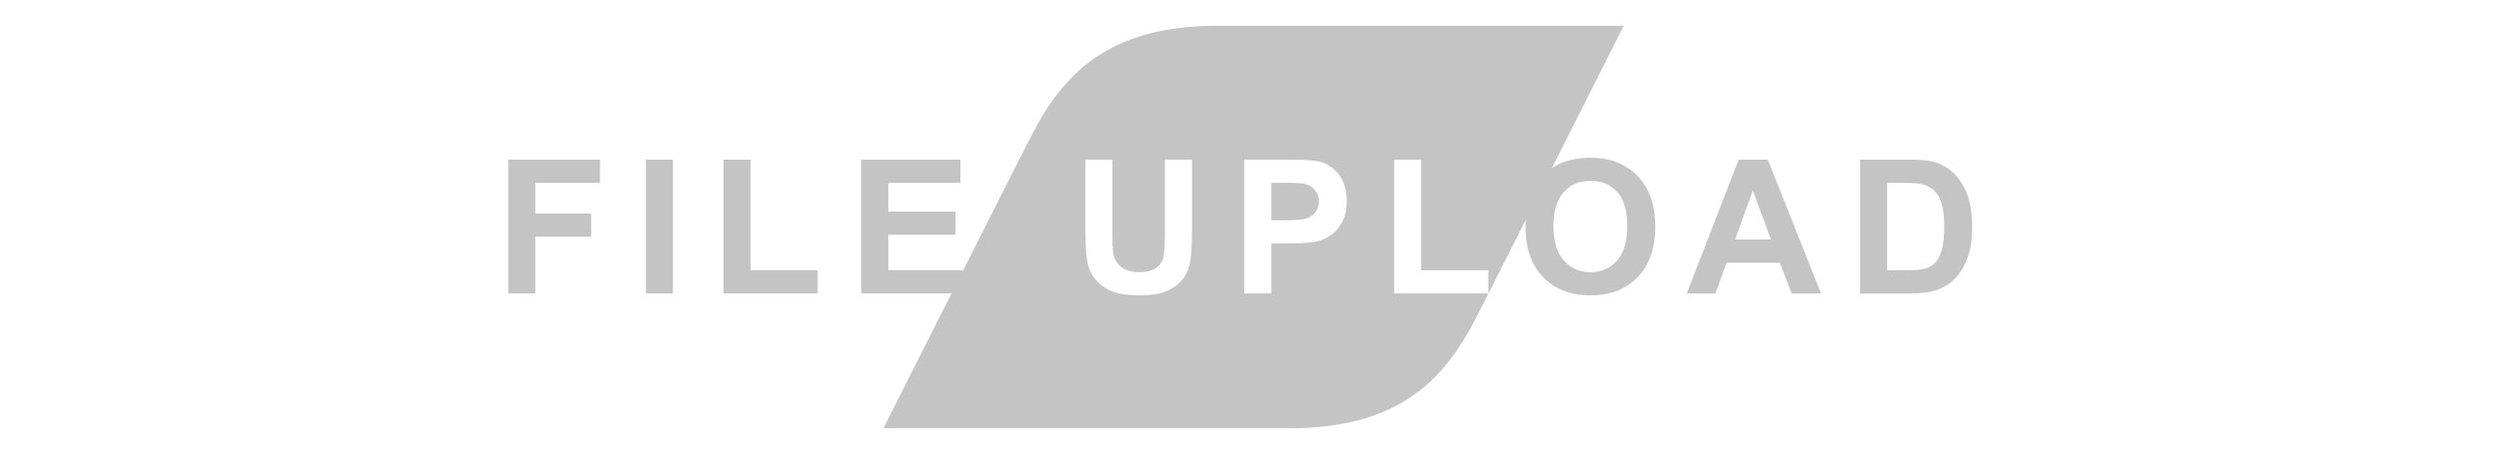 TRANNYS Nav Icon_File Upload_RGB Grey 1.jpg